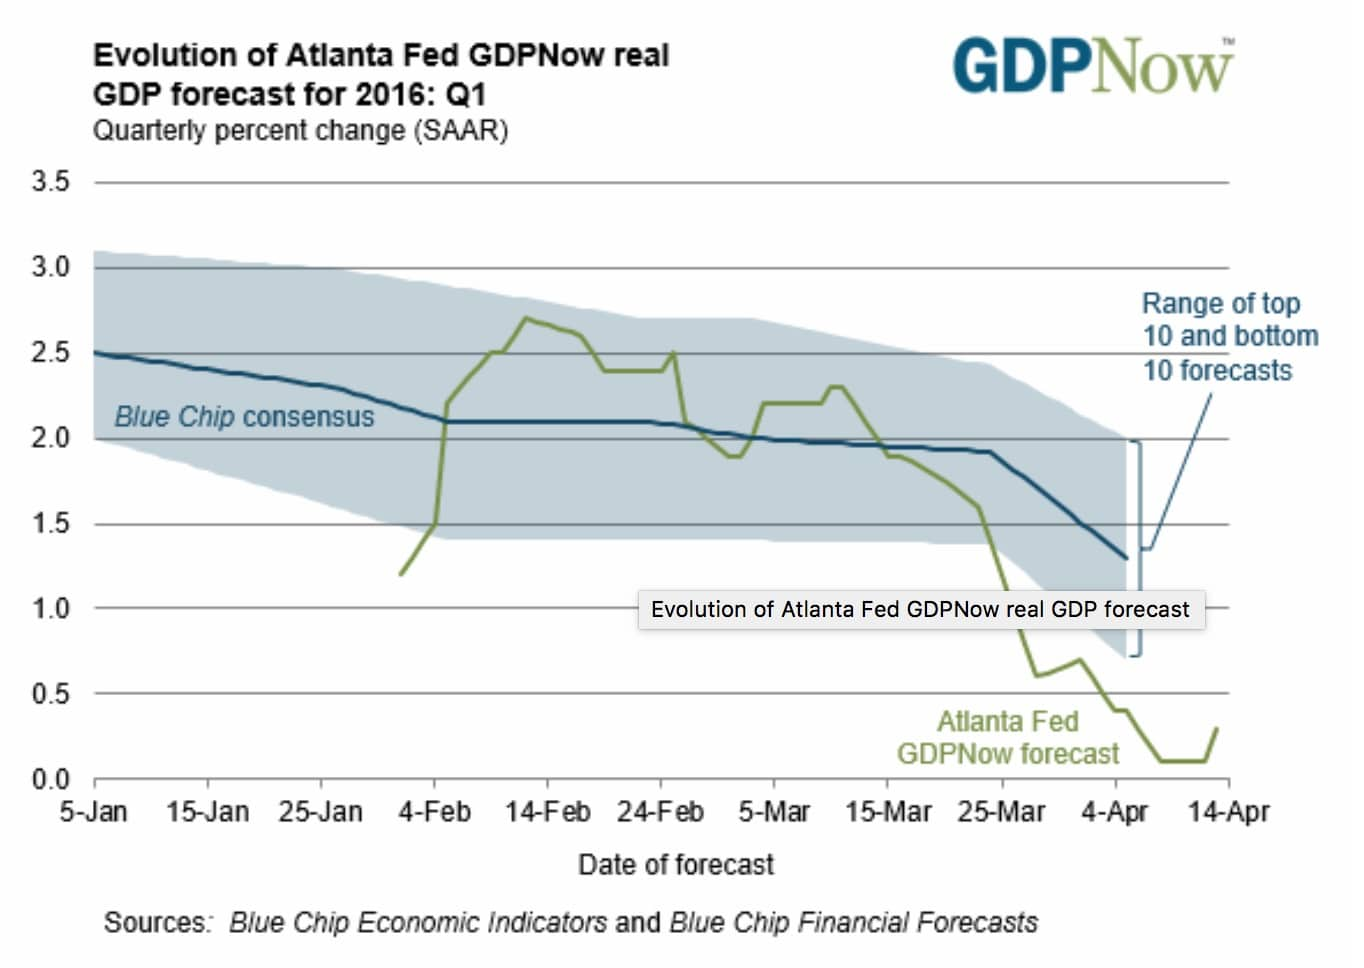 Evolucion de la prevision del PIB de la Fed de Atlanta GDPNow para 2016 en Q1